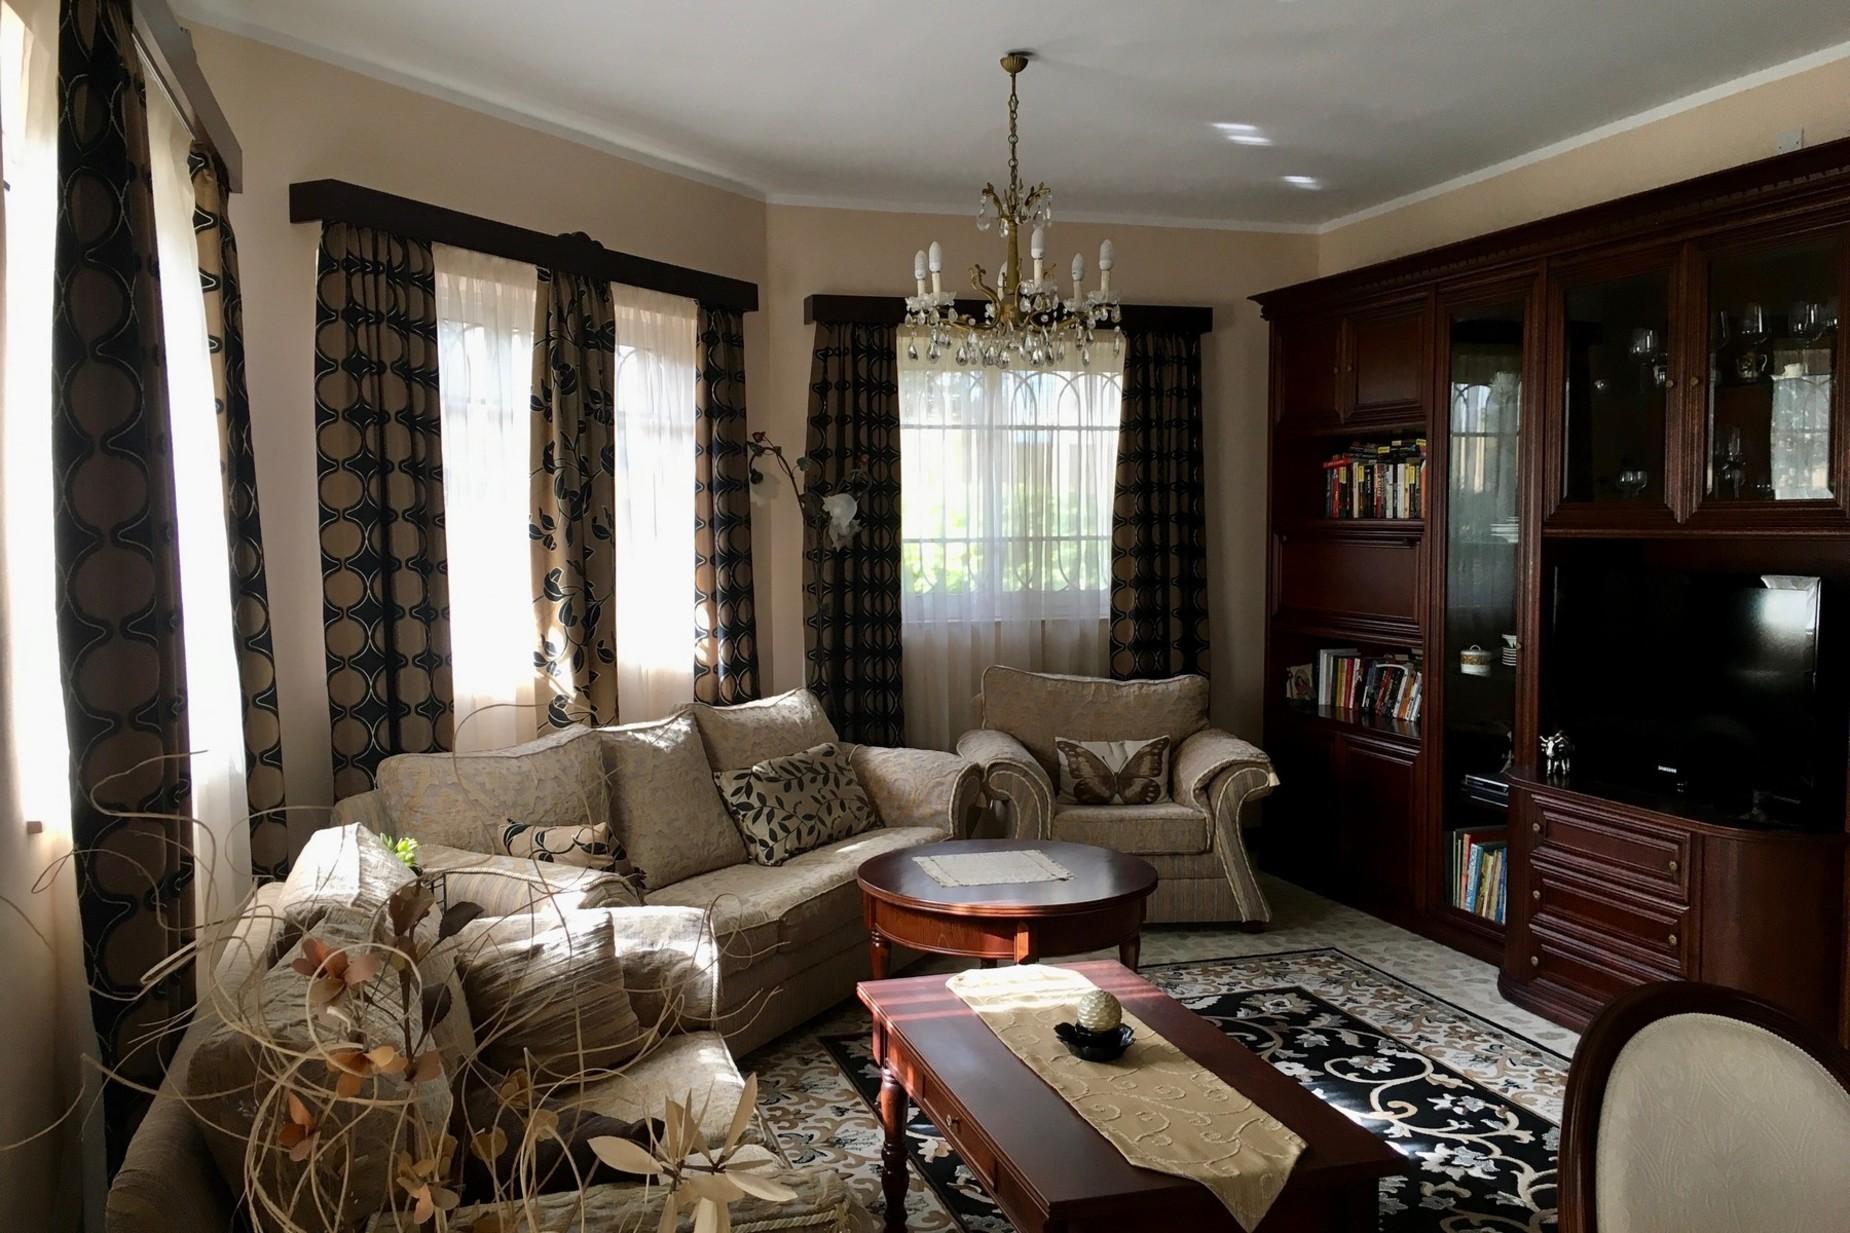 4 bed Villa For Sale in Qawra, Qawra - thumb 3